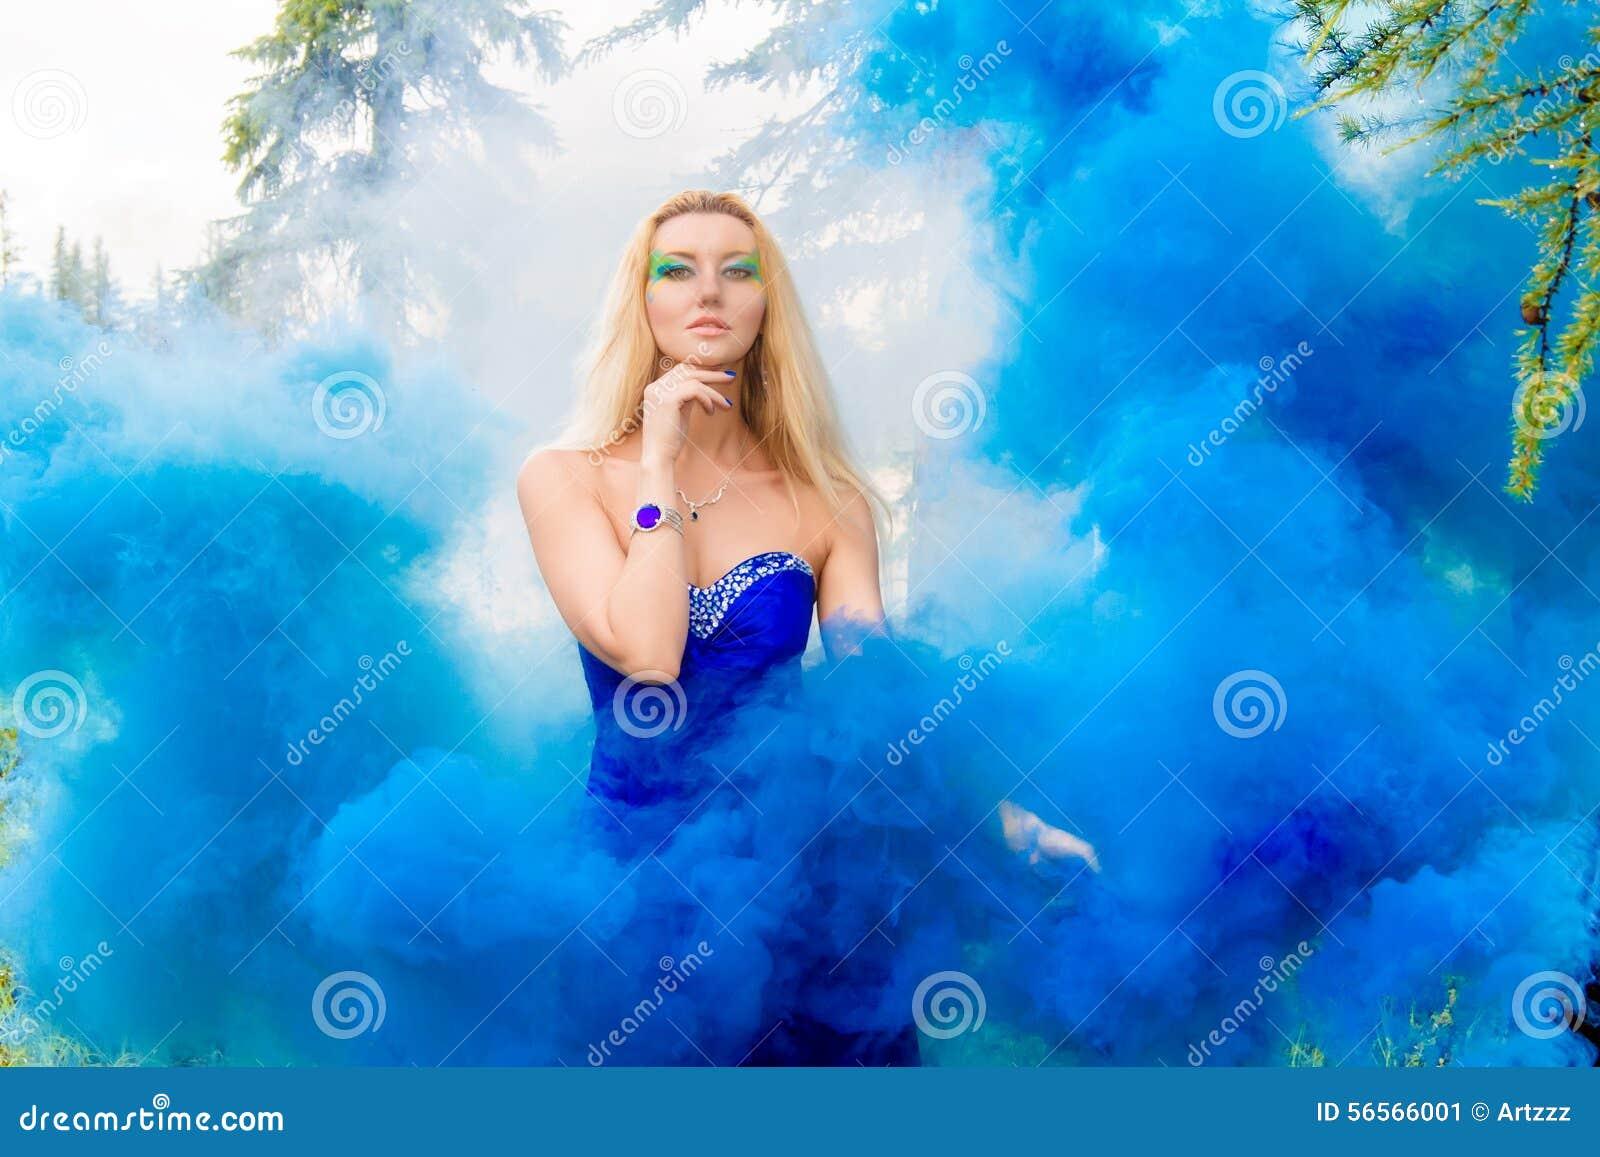 Download Όμορφη νέα γυναίκα σε ένα σύννεφο ενός φωτεινού μπλε καπνού Στοκ Εικόνα - εικόνα από καυκάσιος, φόρεμα: 56566001